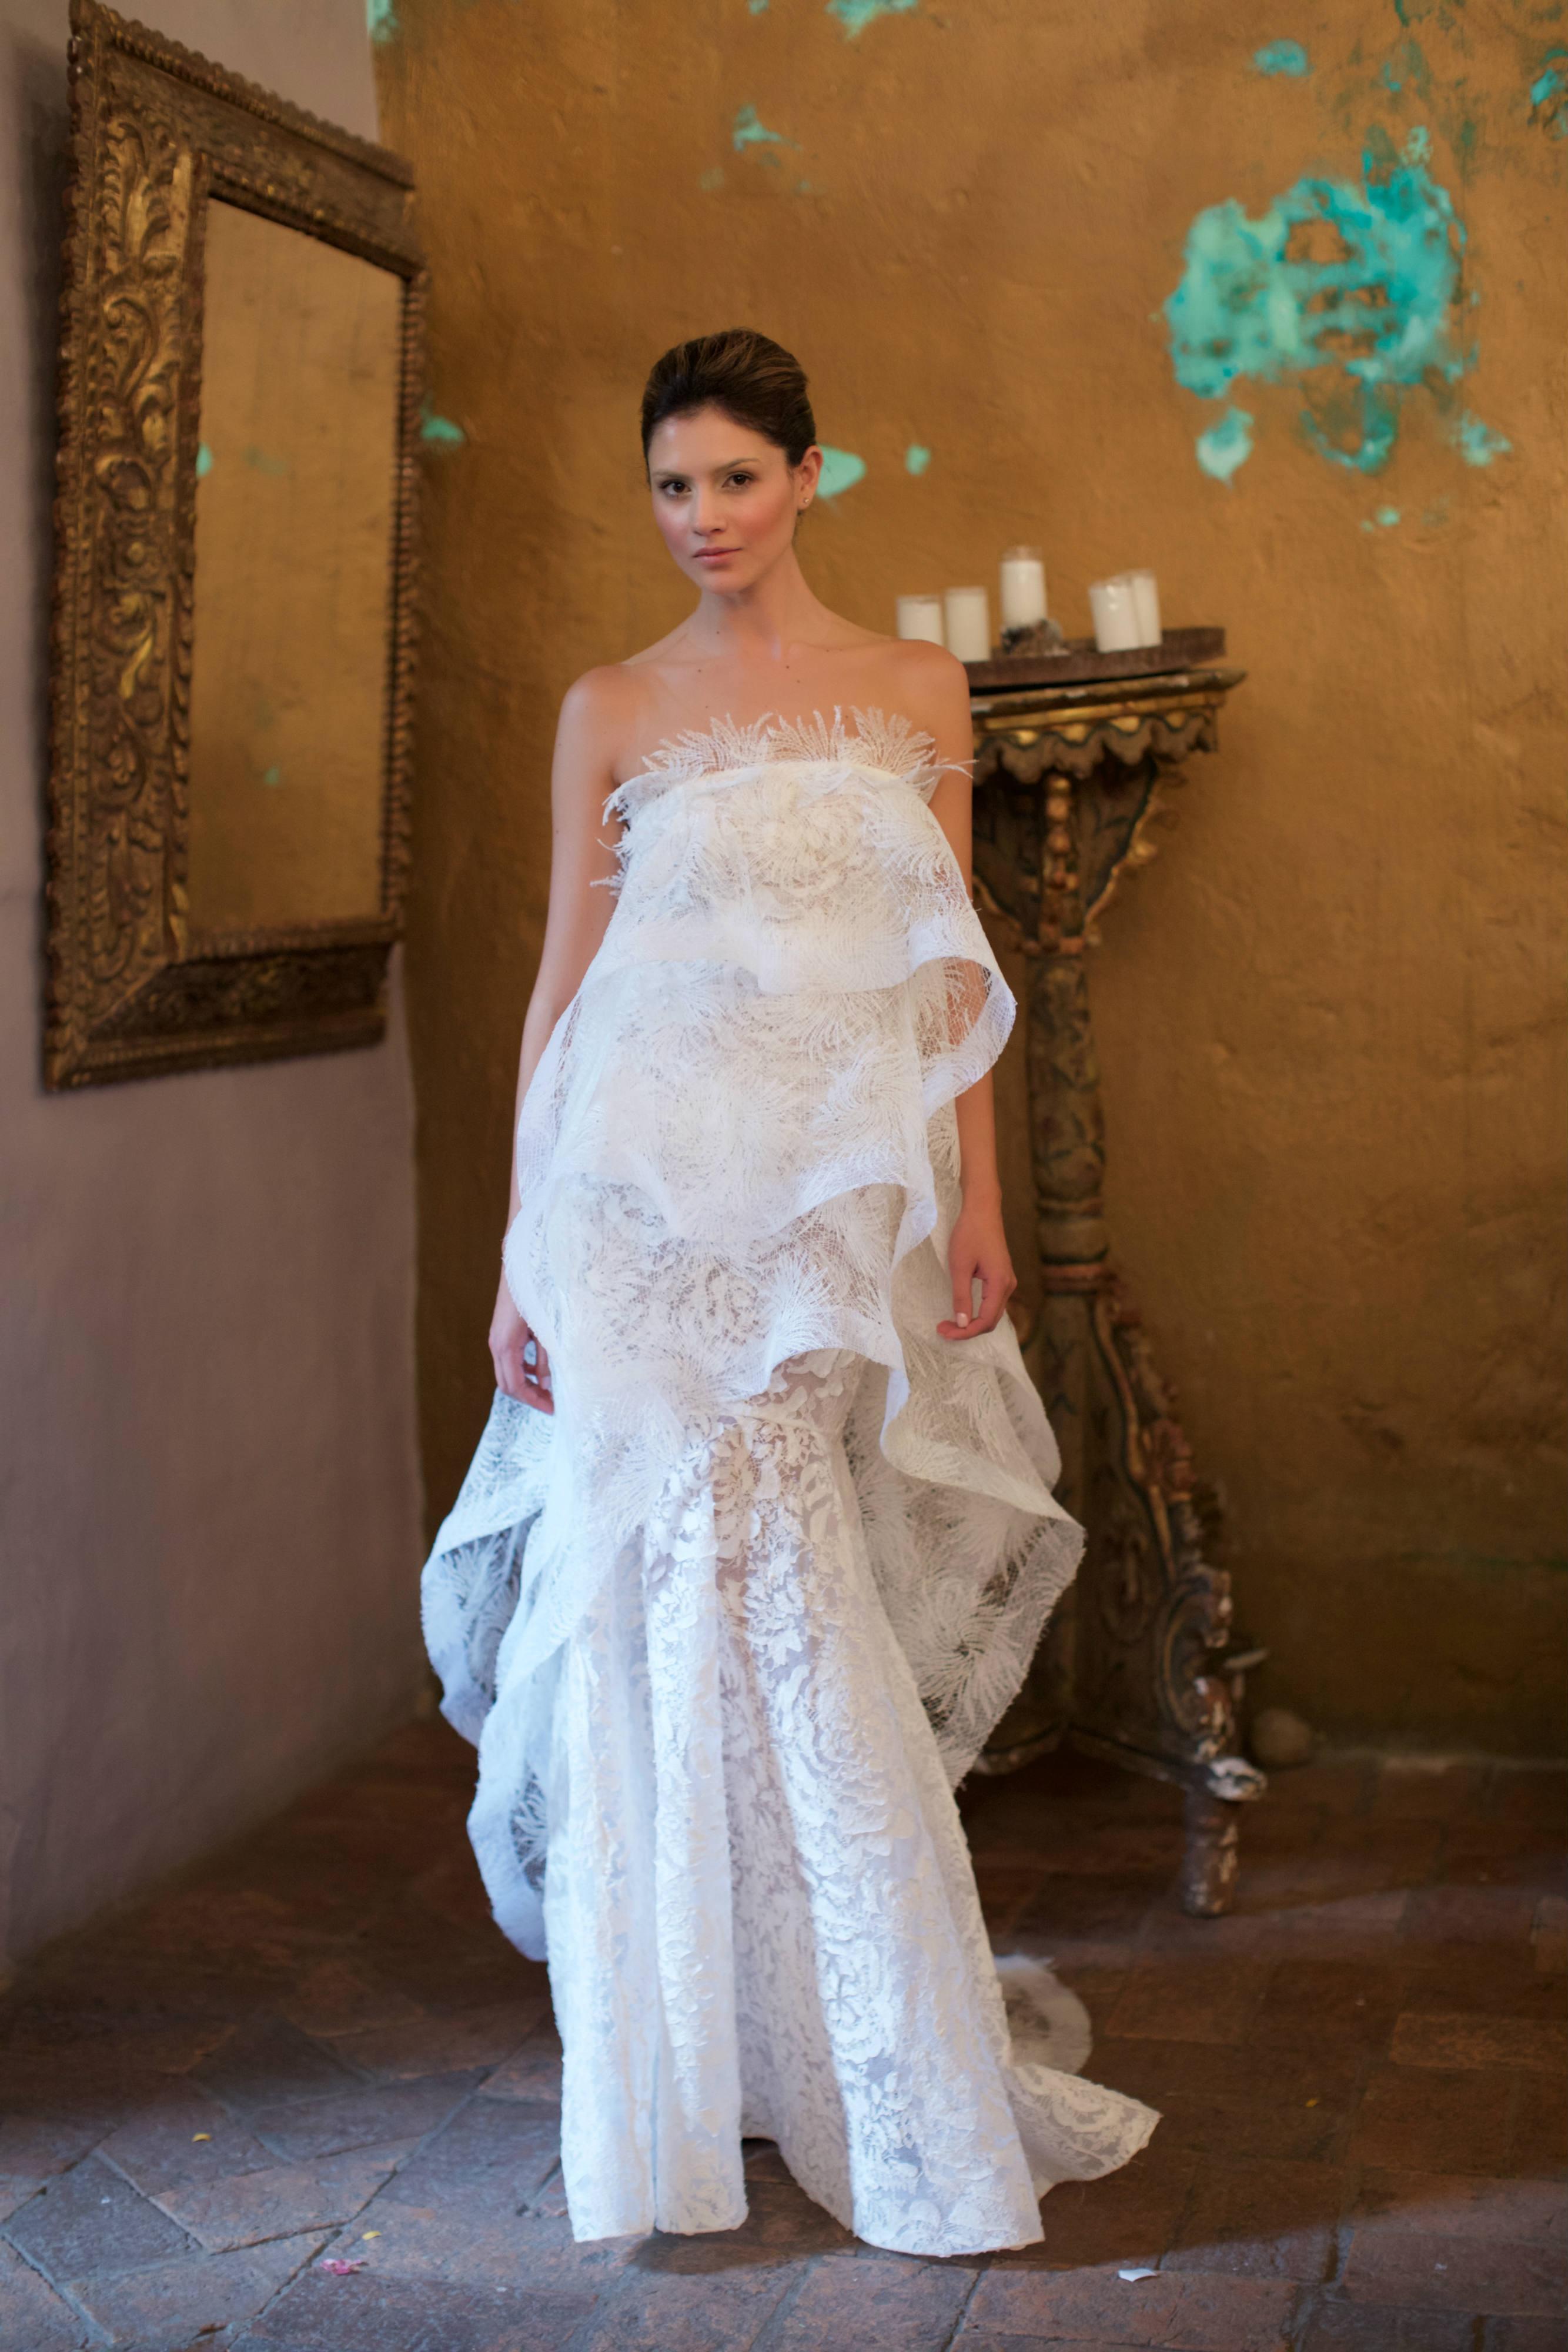 La novia perfecta, según Silvia Tcherassi - Univision